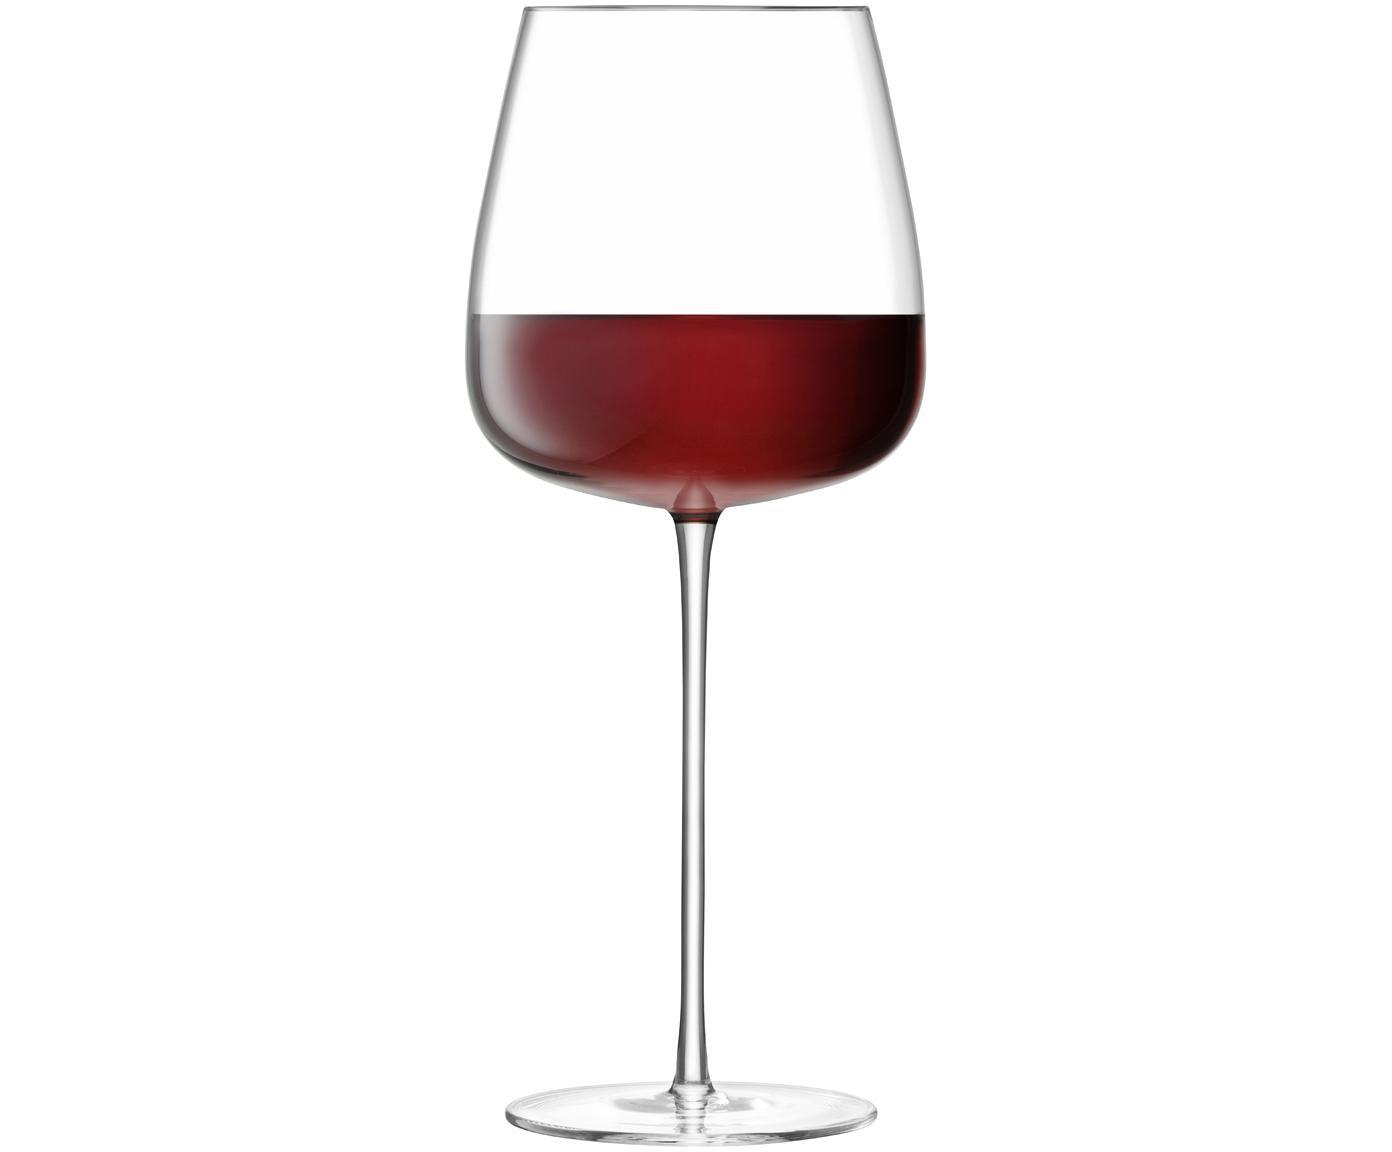 Mondgeblazen rode wijnglazen Wine Culture, 2 stuks, Glas, Transparant, Ø 11 x H 26 cm